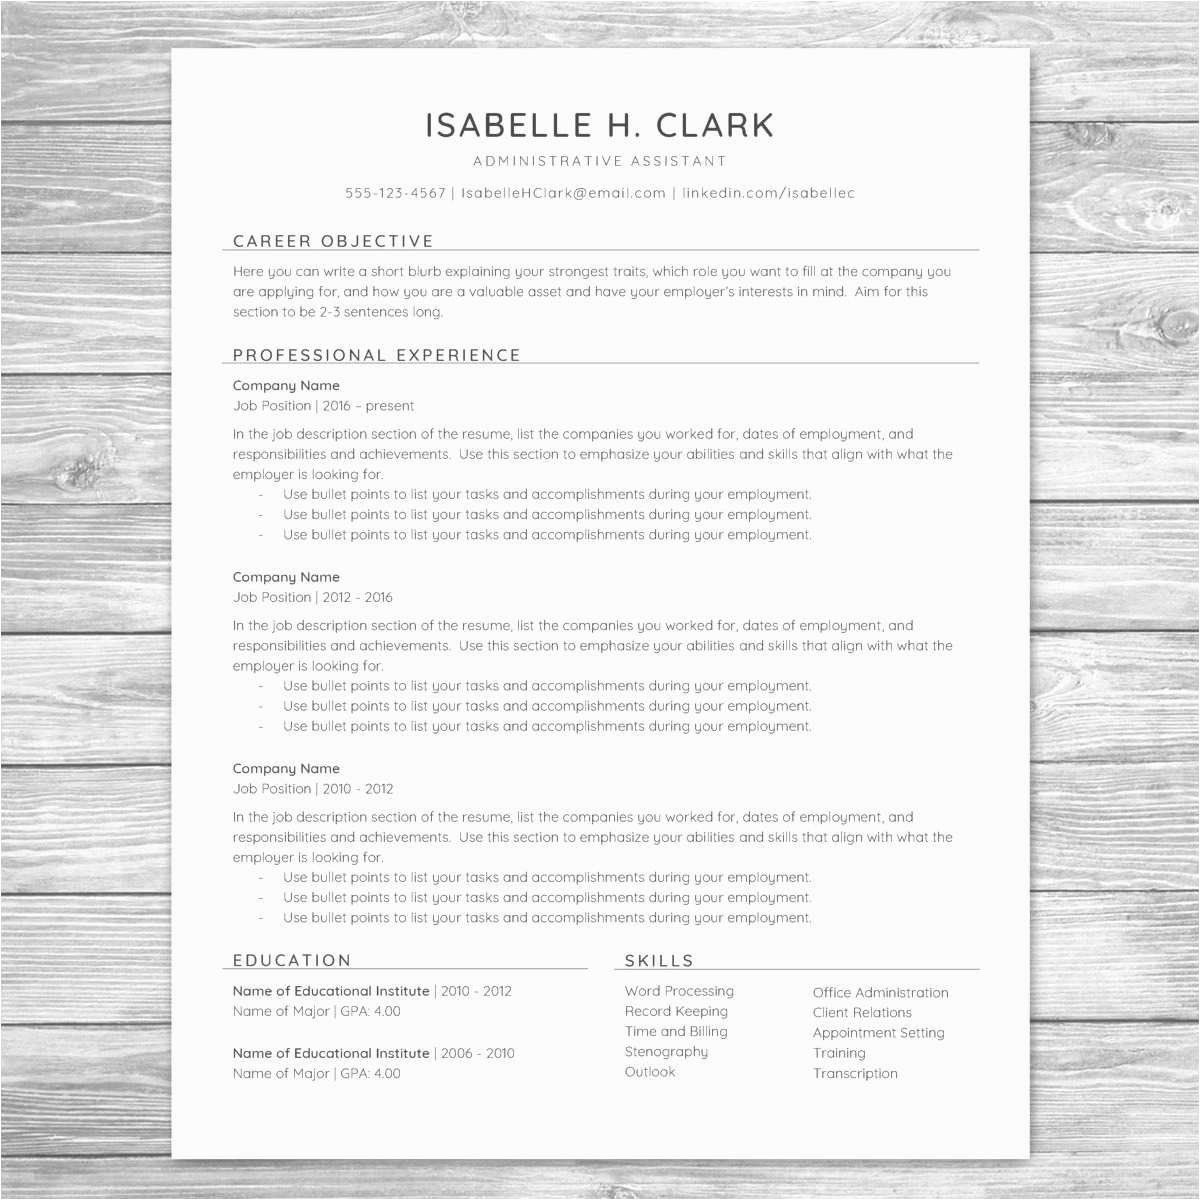 H1b Premium Processing Resume New Paralegal Job